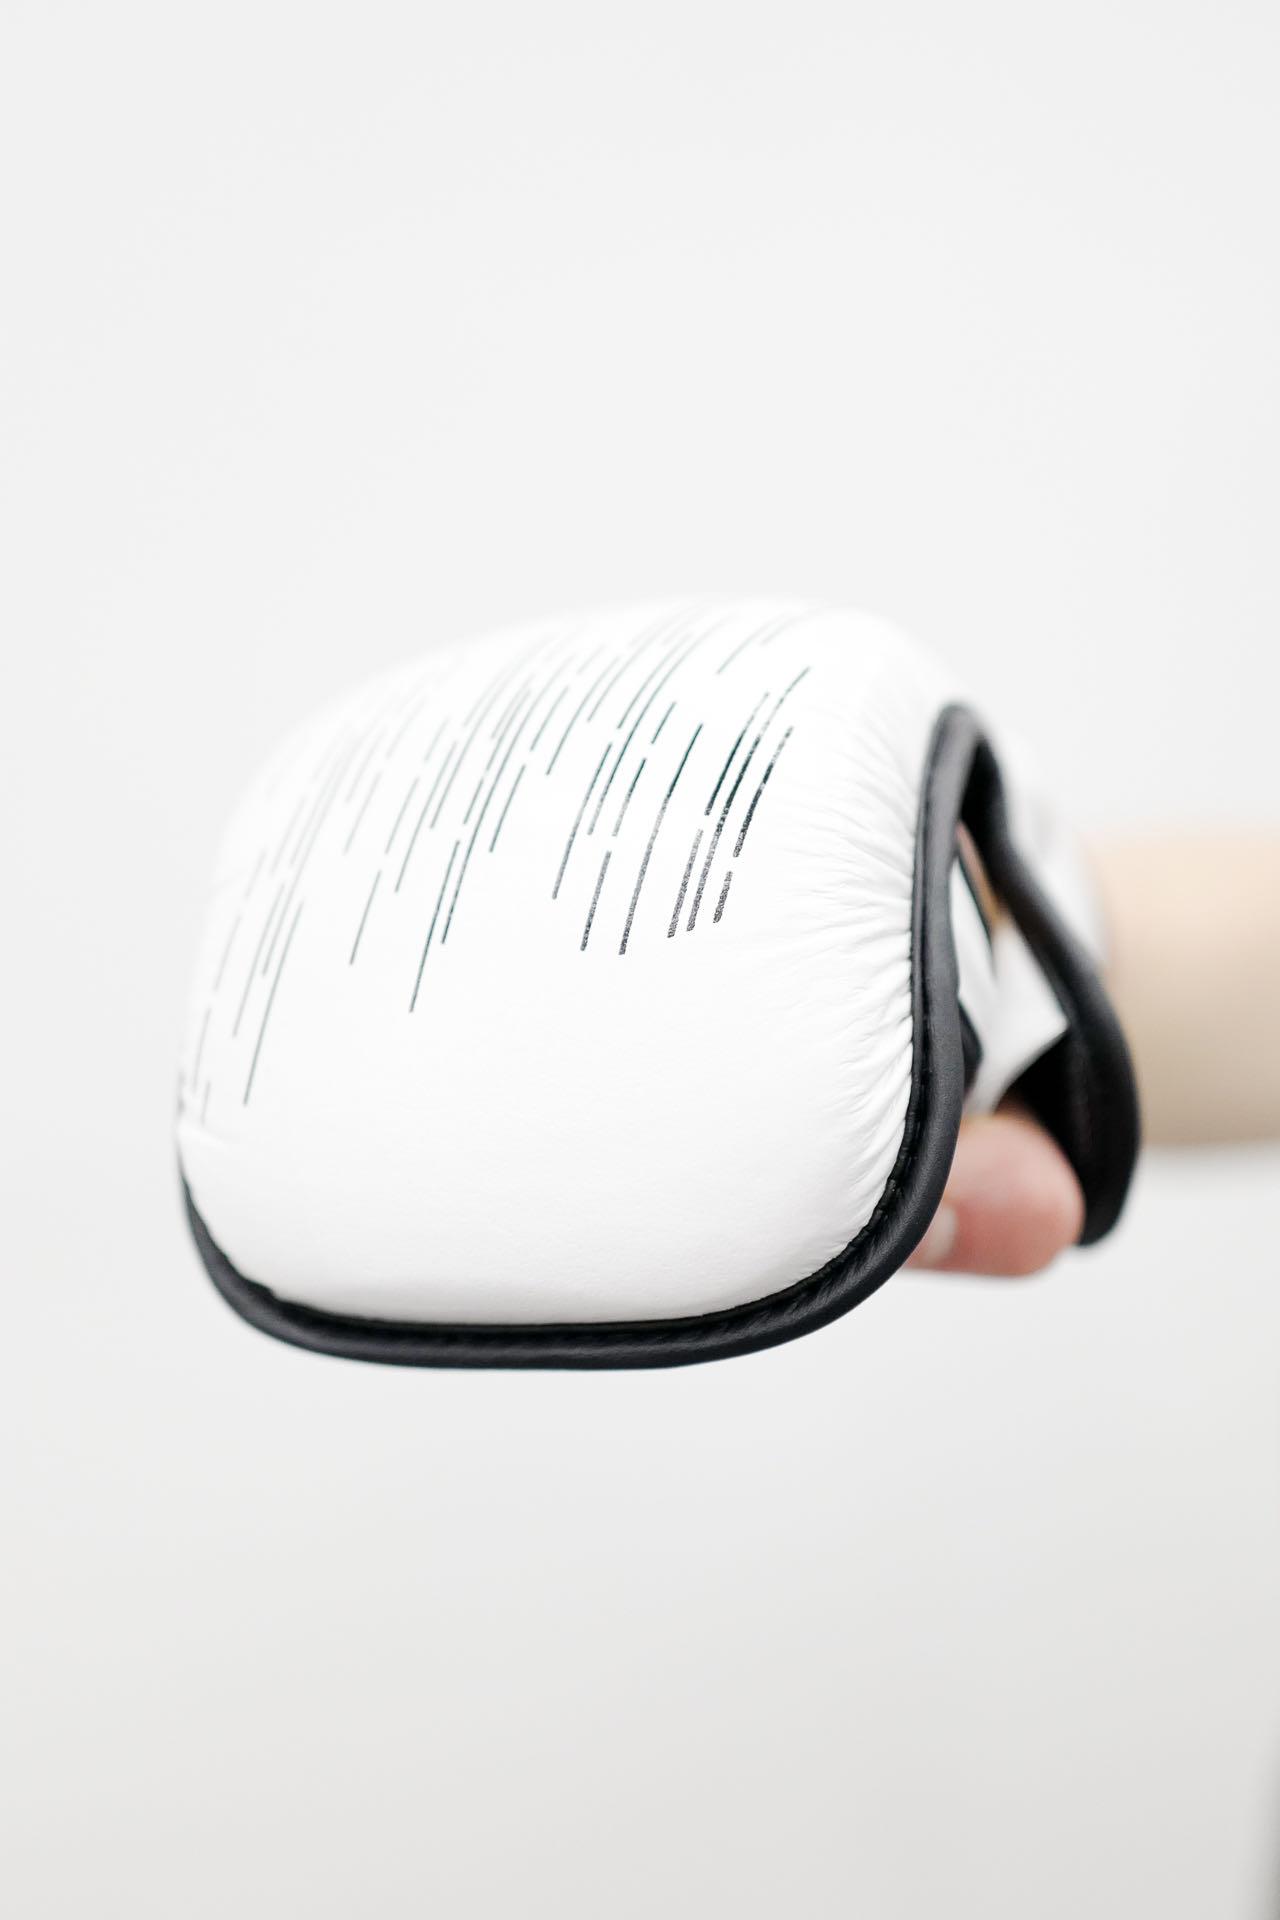 fengbao fundamentals mma handschuhe grappling boxen kickboxen 1080 wien cross squashed